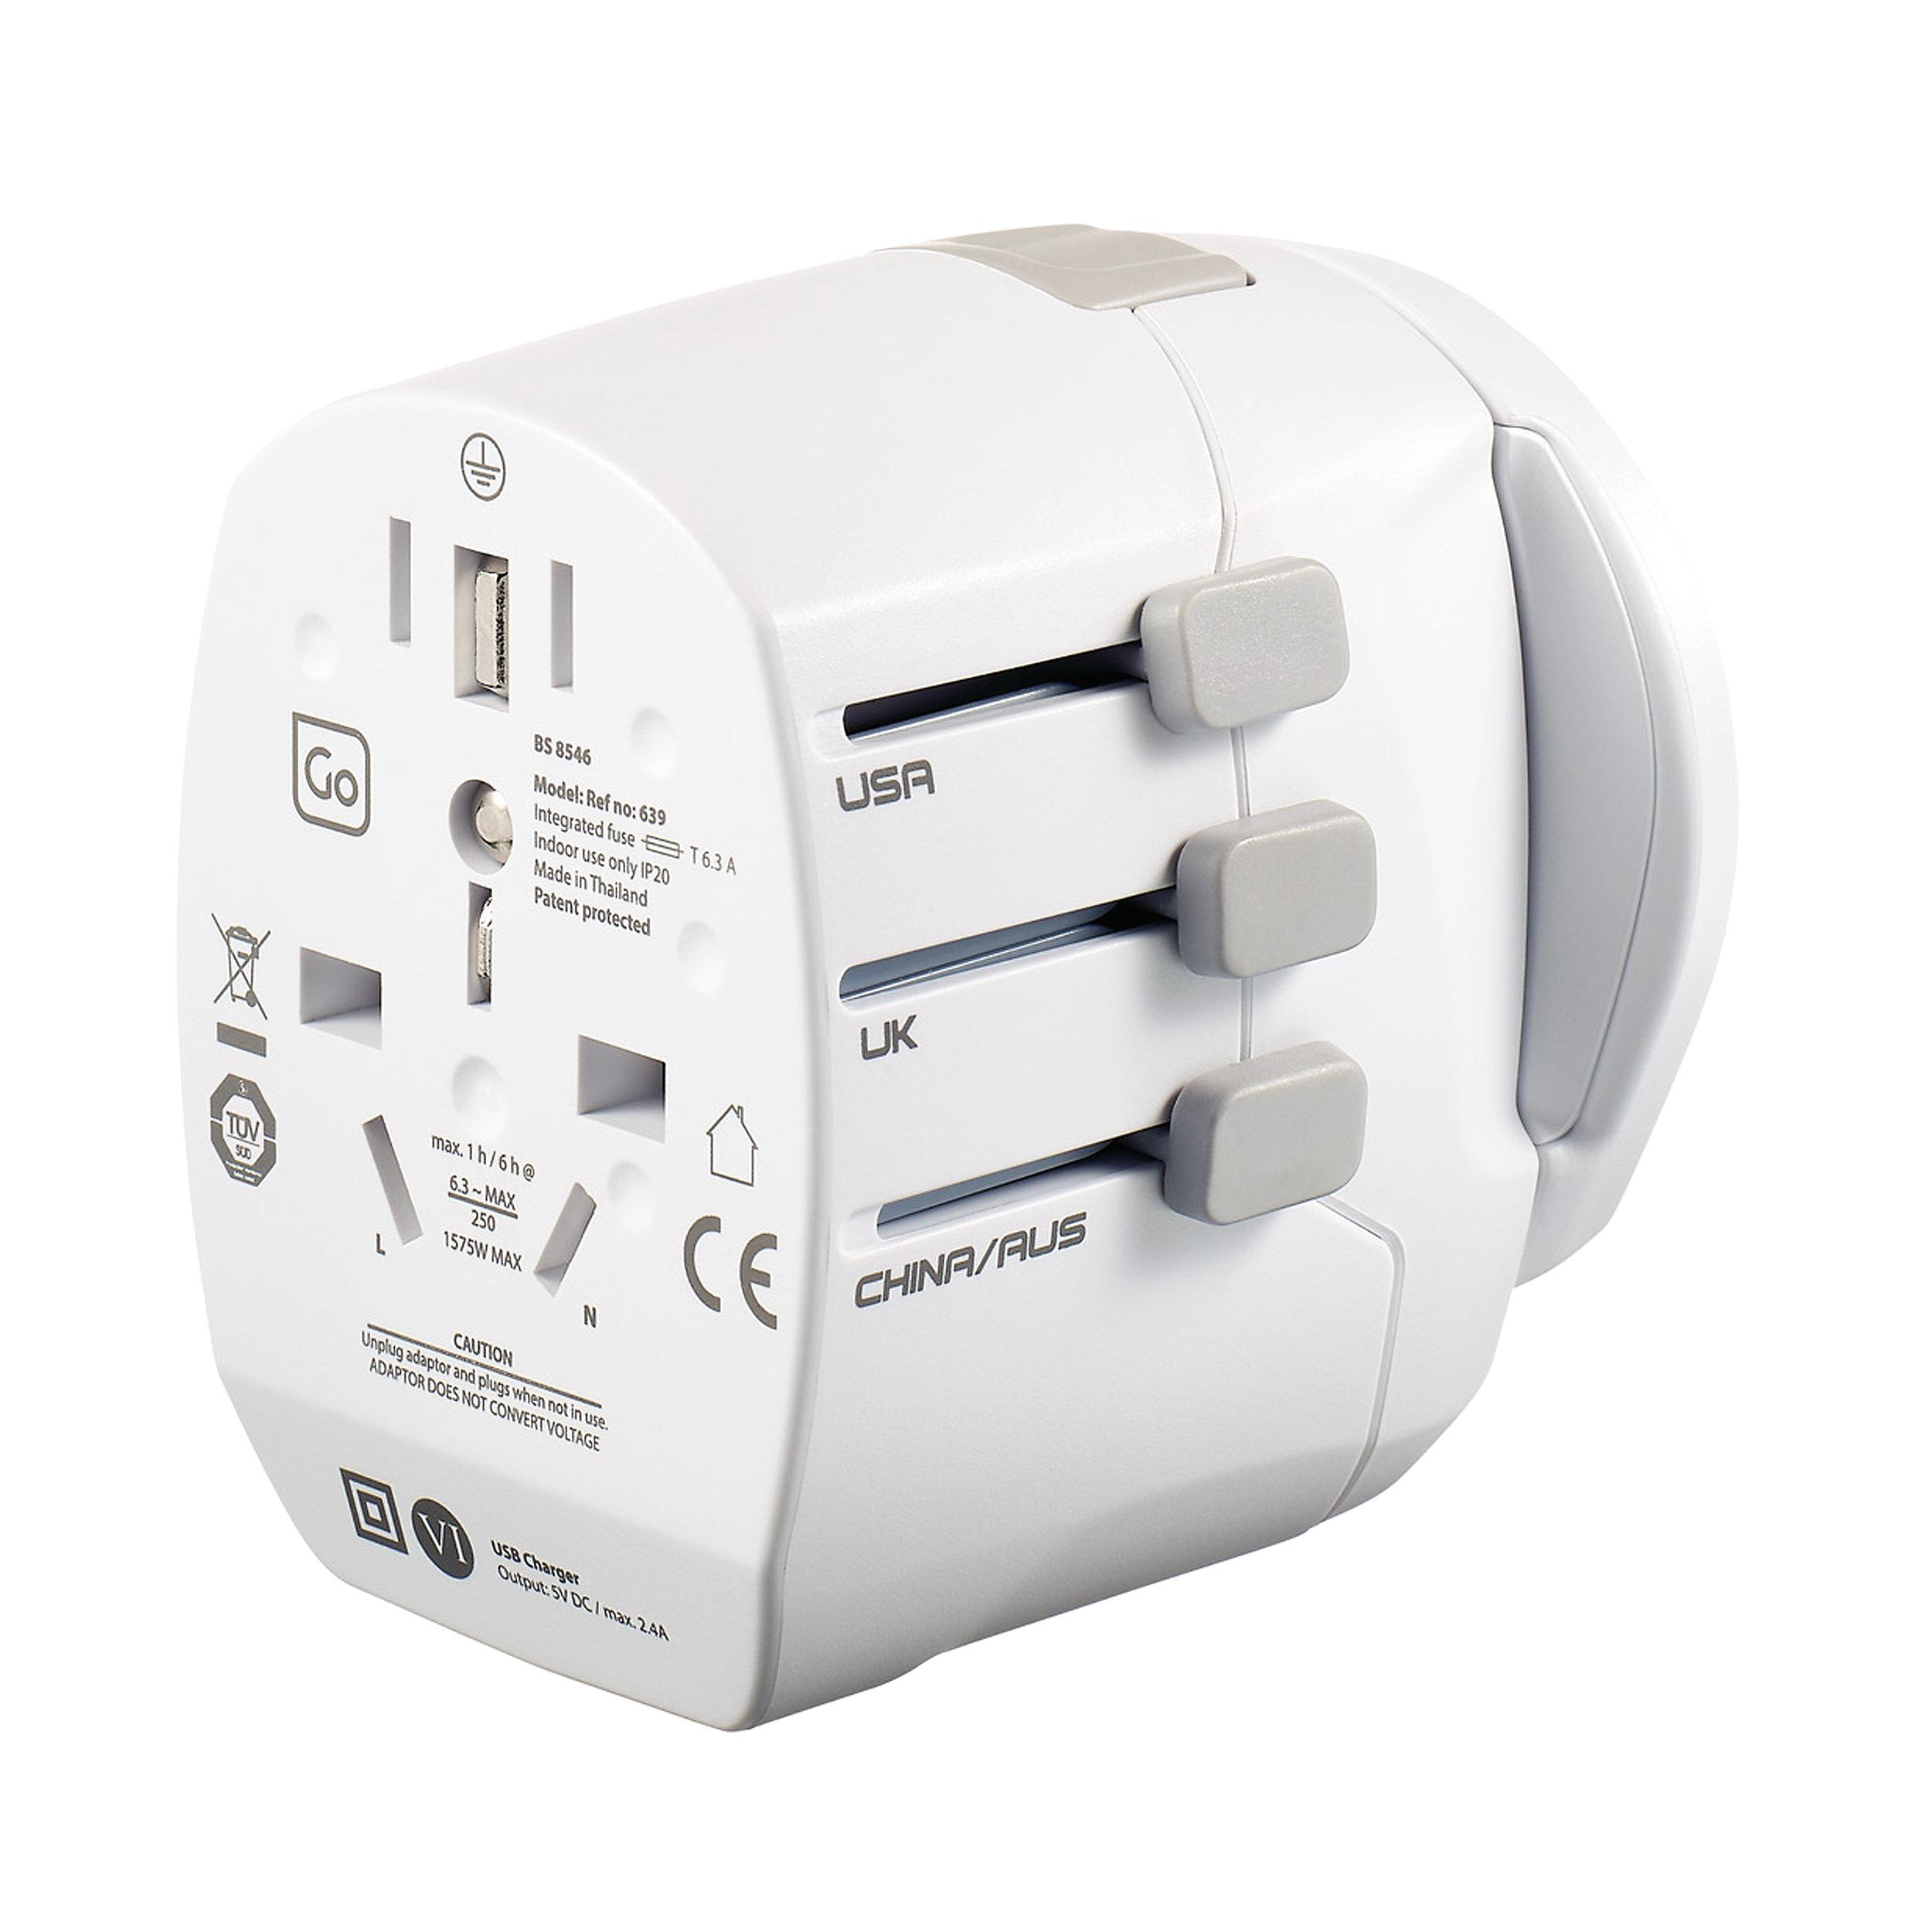 Adaptor worldwide + USB